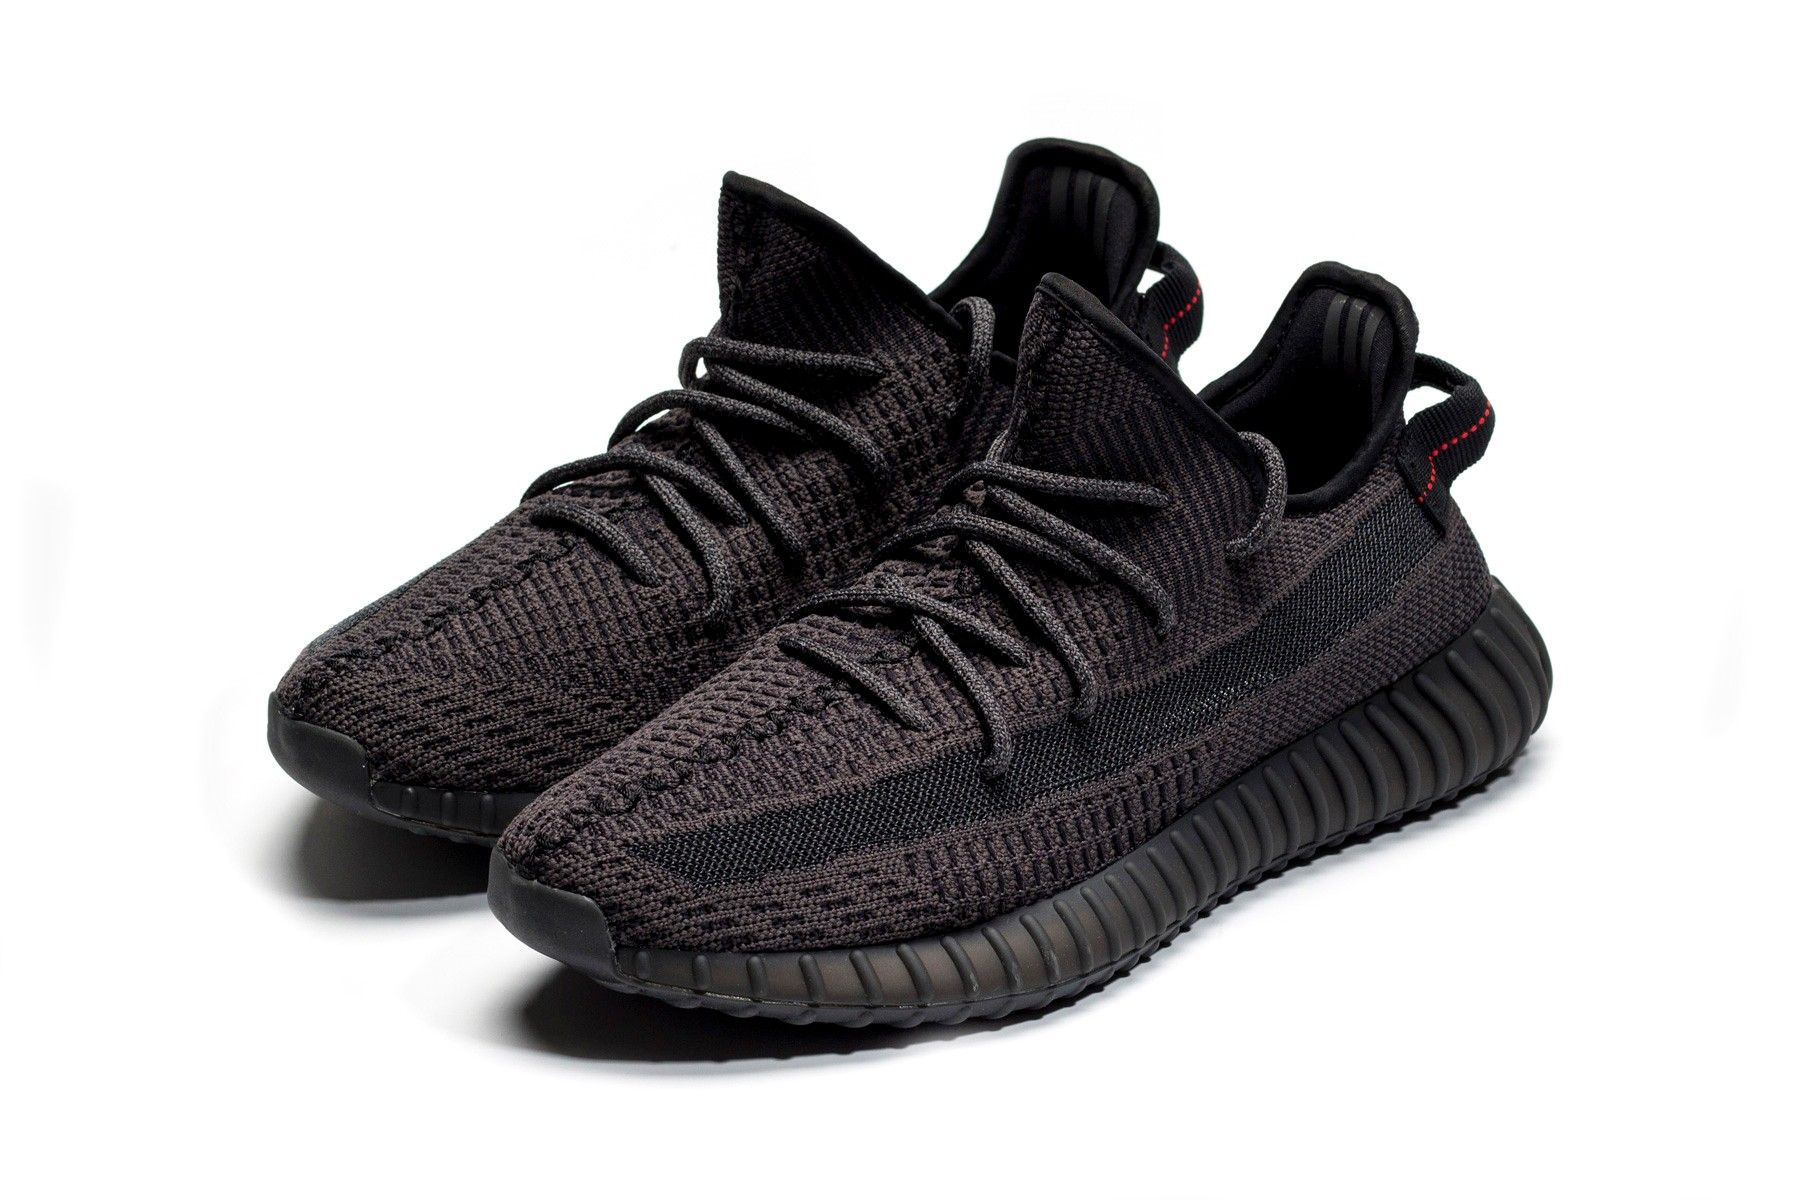 yeezy 350 b2 black